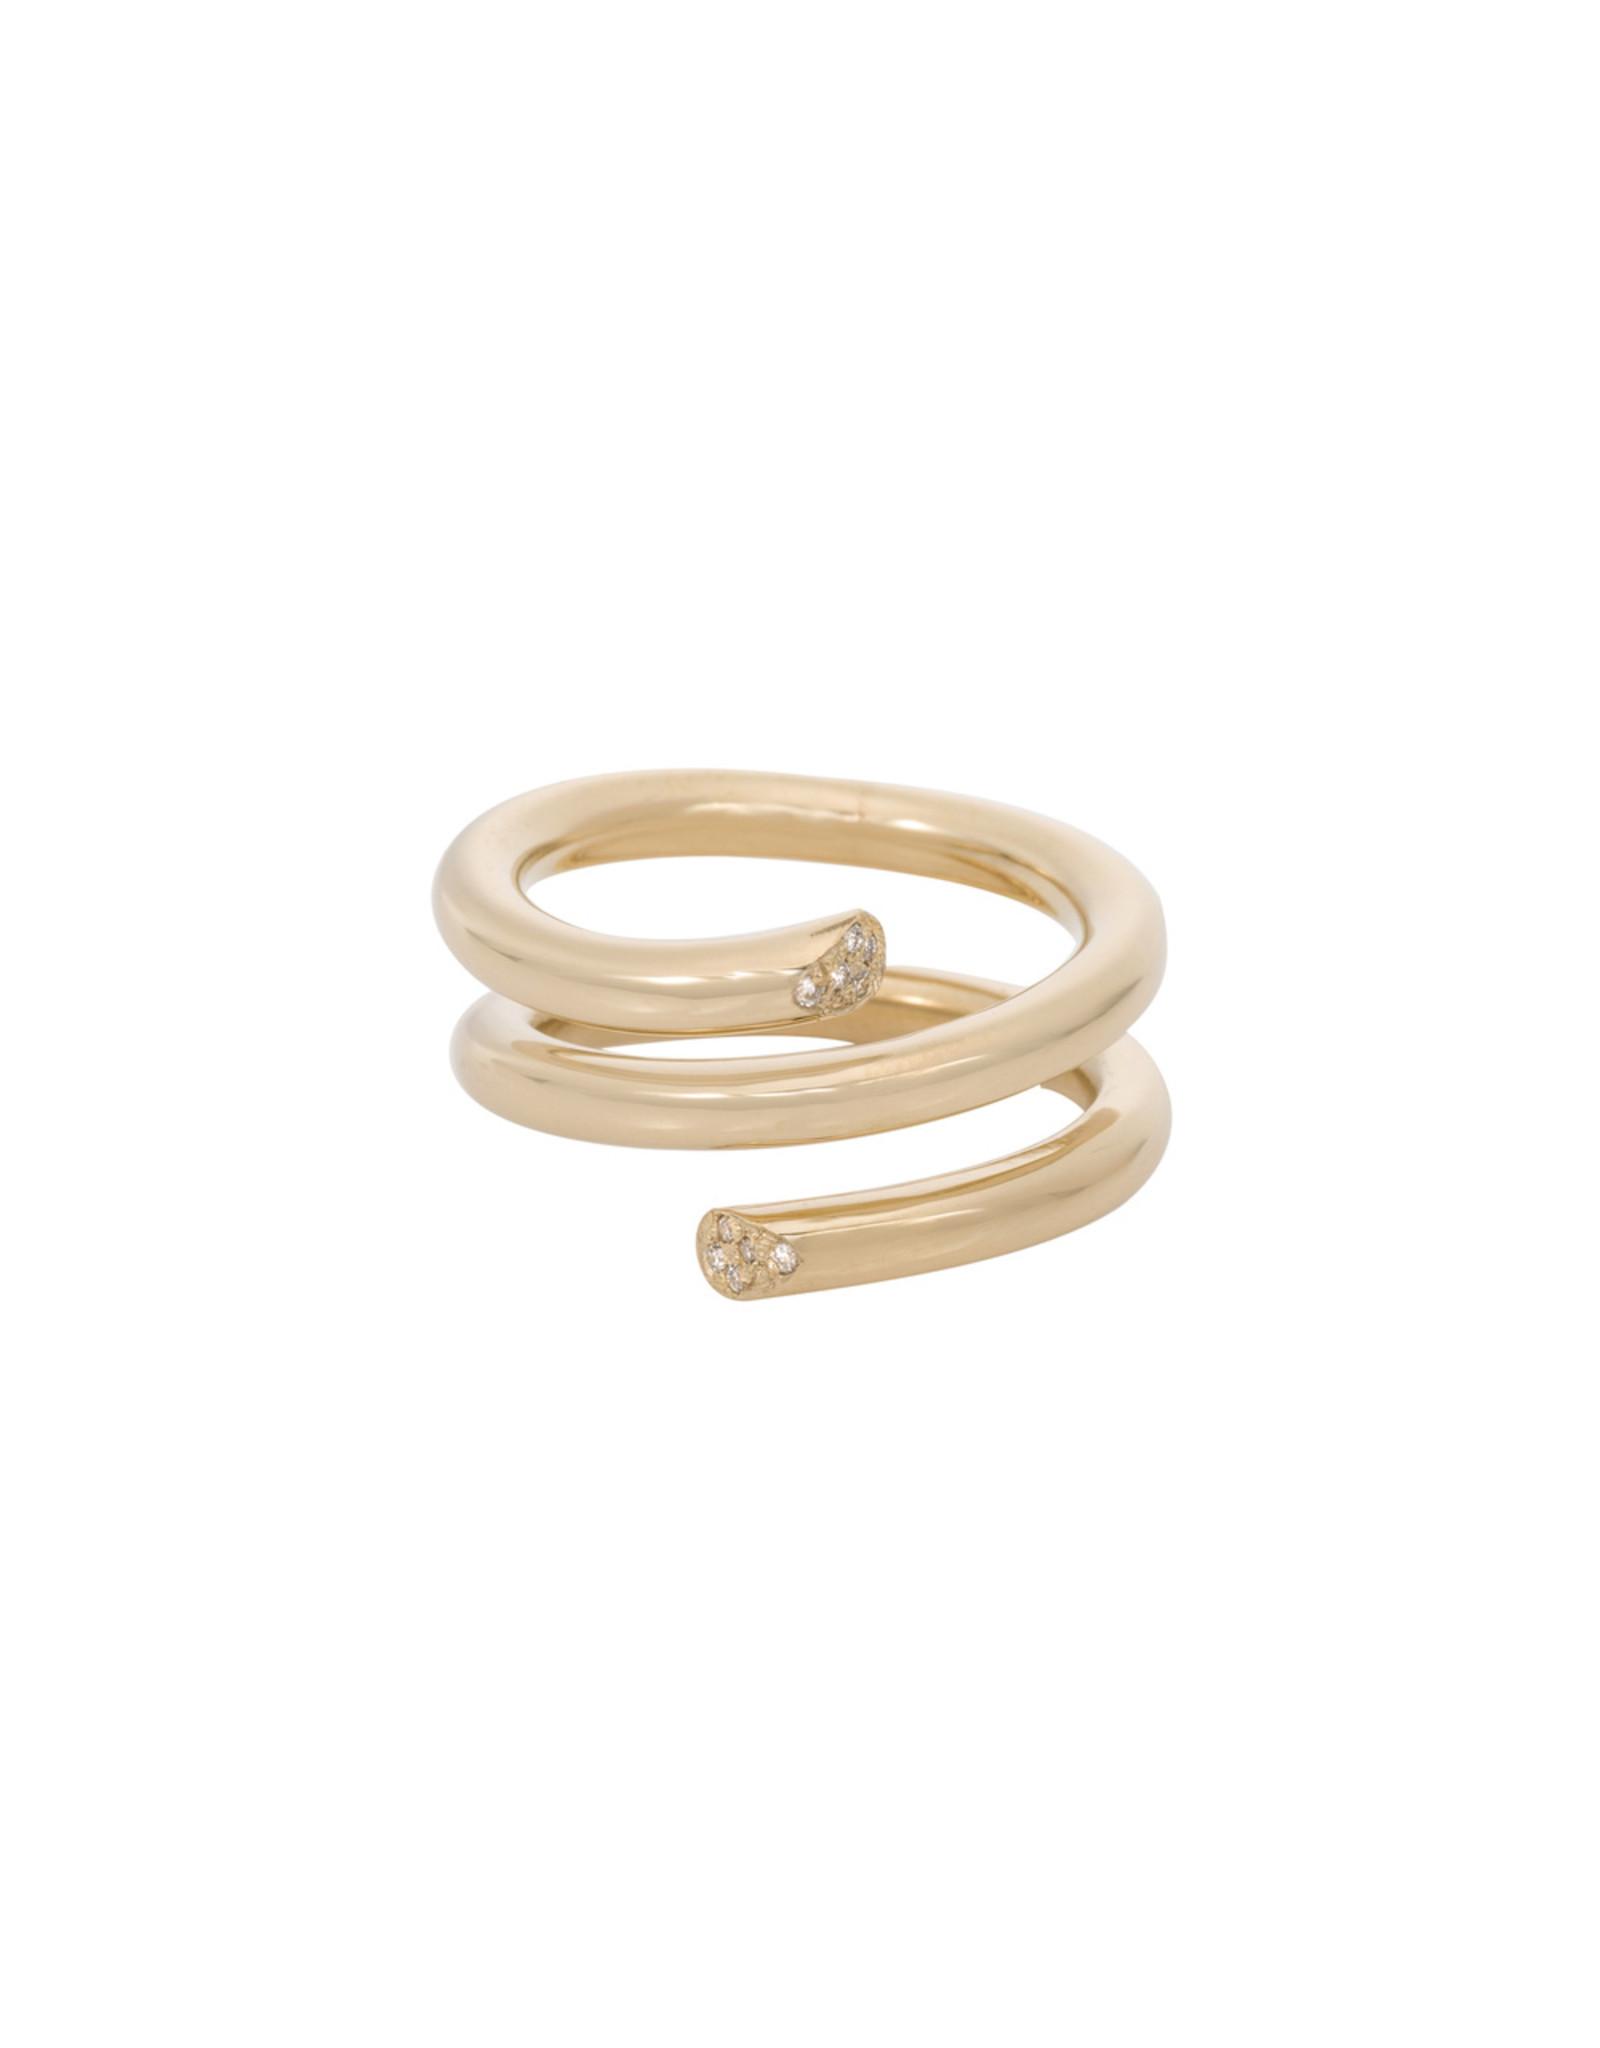 Ariel Gordon Ariel Gordon Pavé Spring Ring (Color: Yellow Gold, Size: 7)